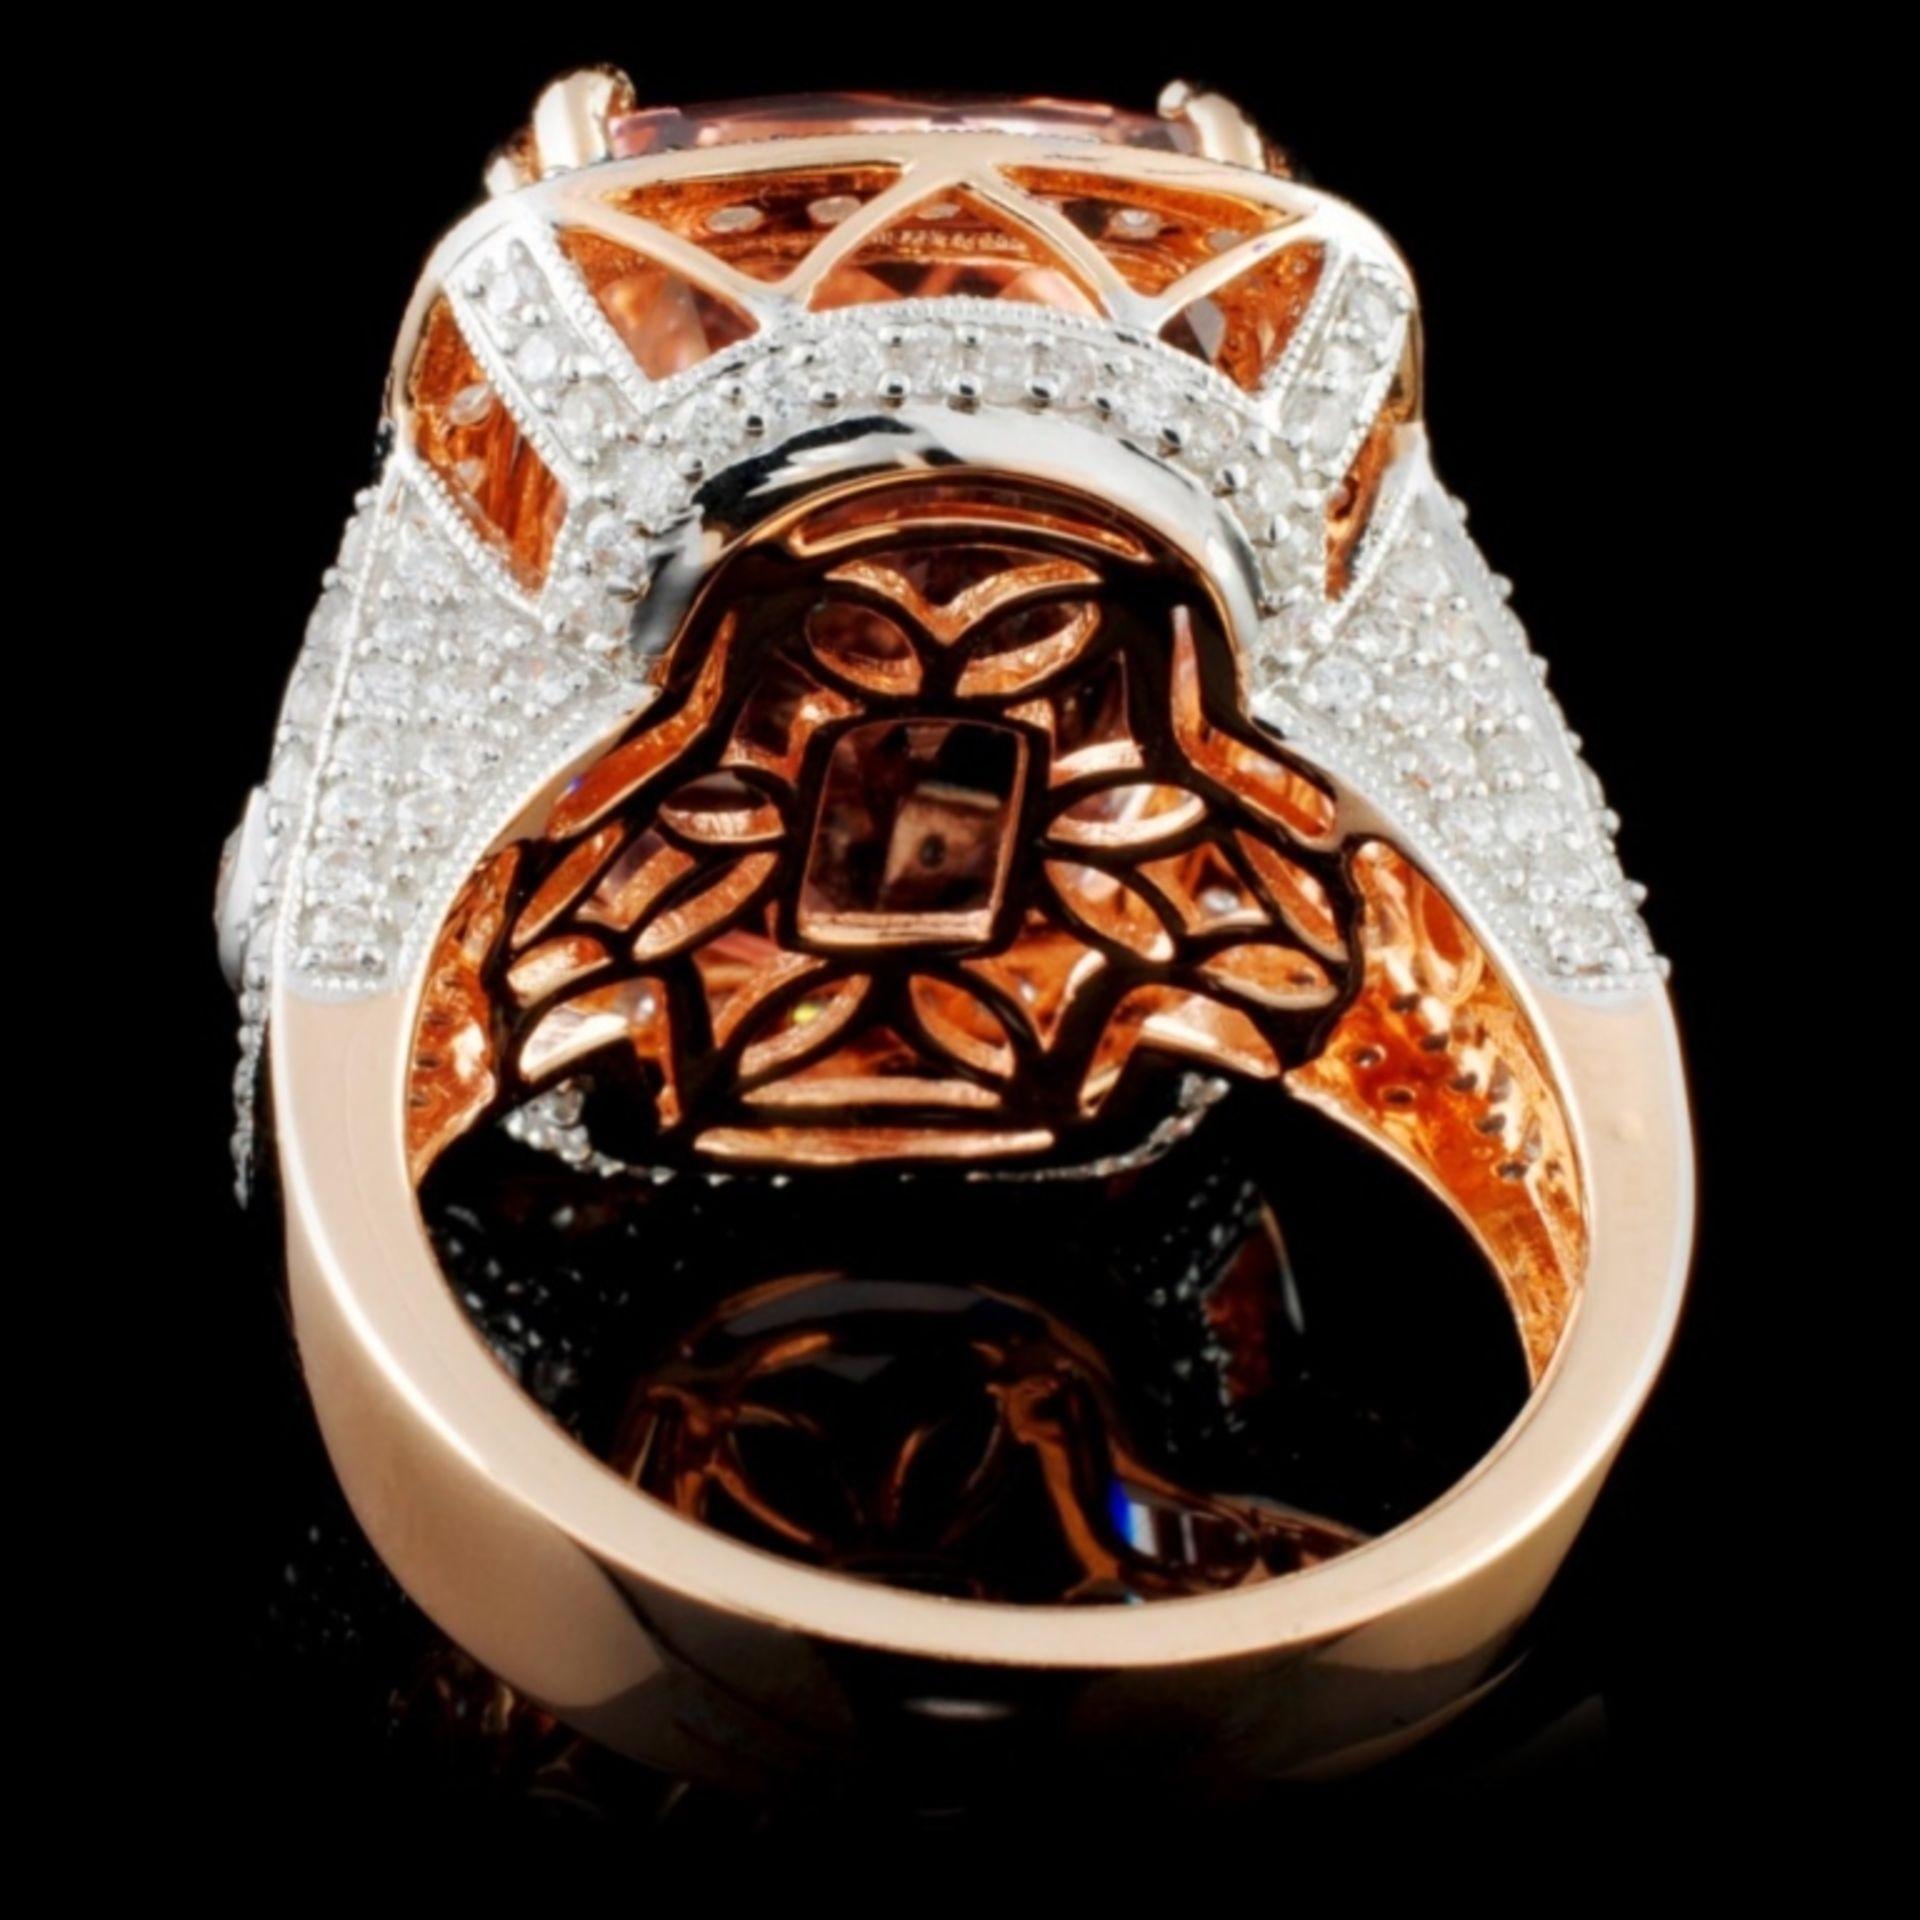 14K Rose Gold 13.88ct Morganite & 1.53ct Diamond R - Image 3 of 4